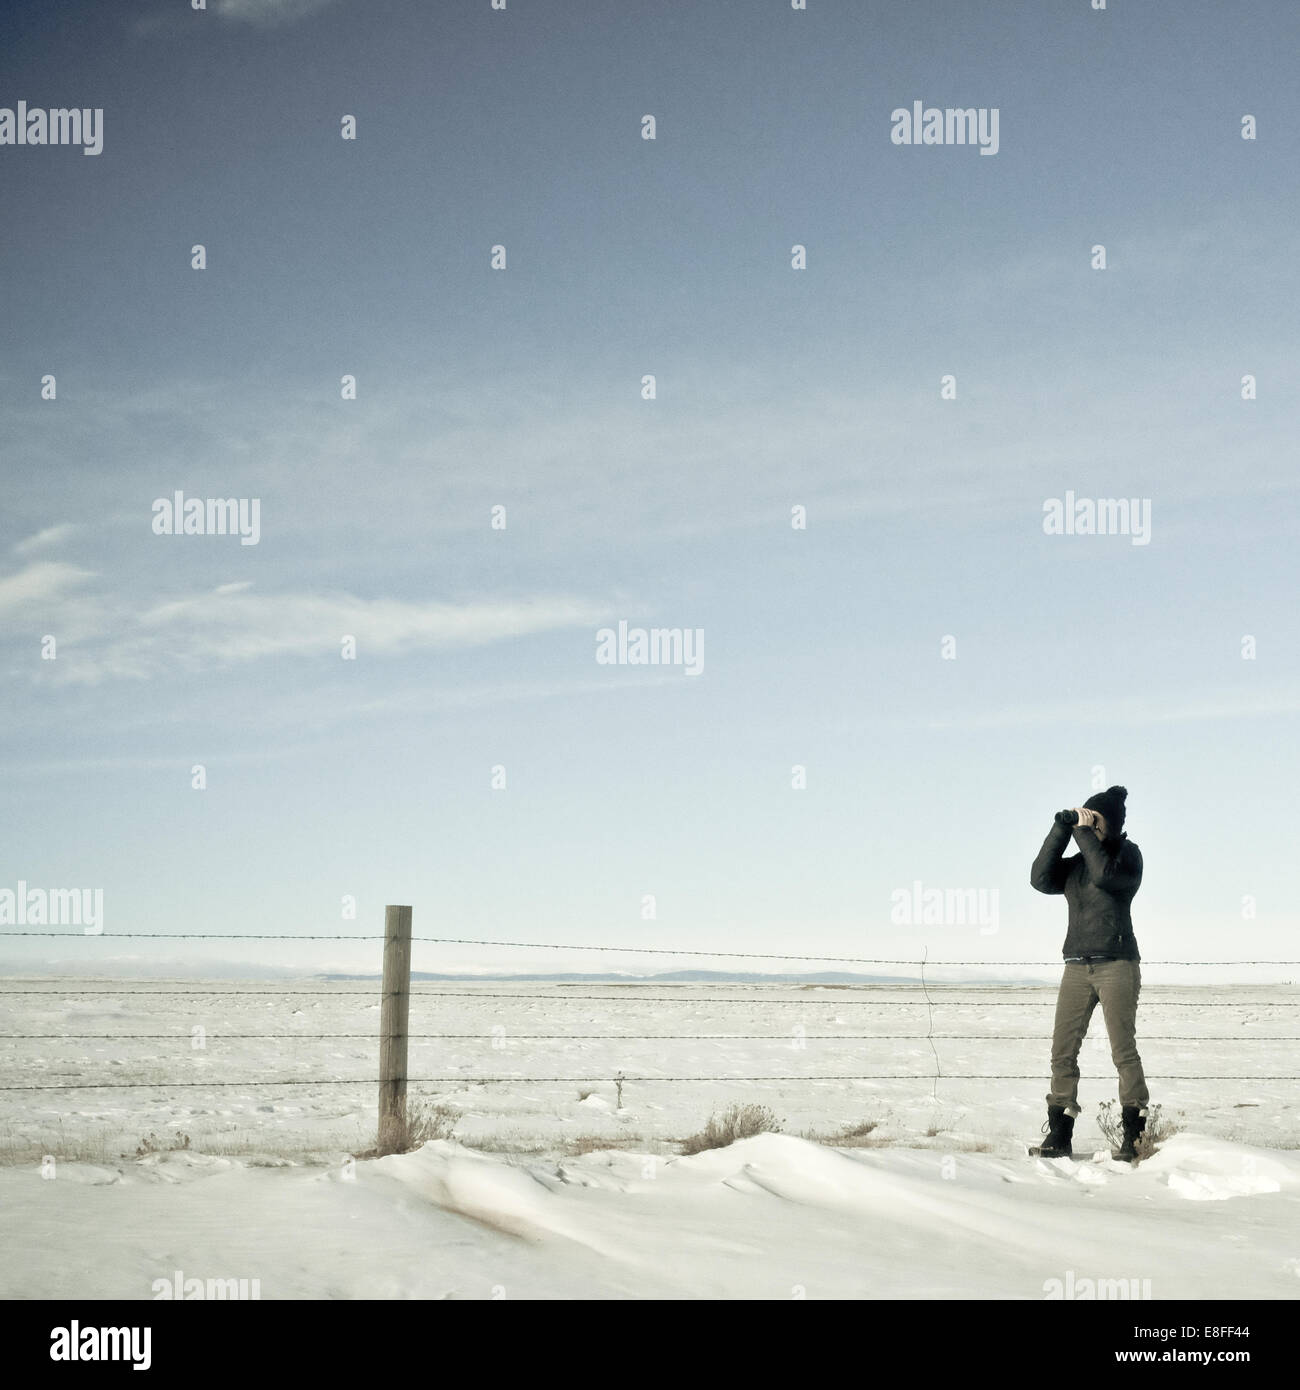 woman looking through binoculars in winter, Wyoming, America, USA - Stock Image